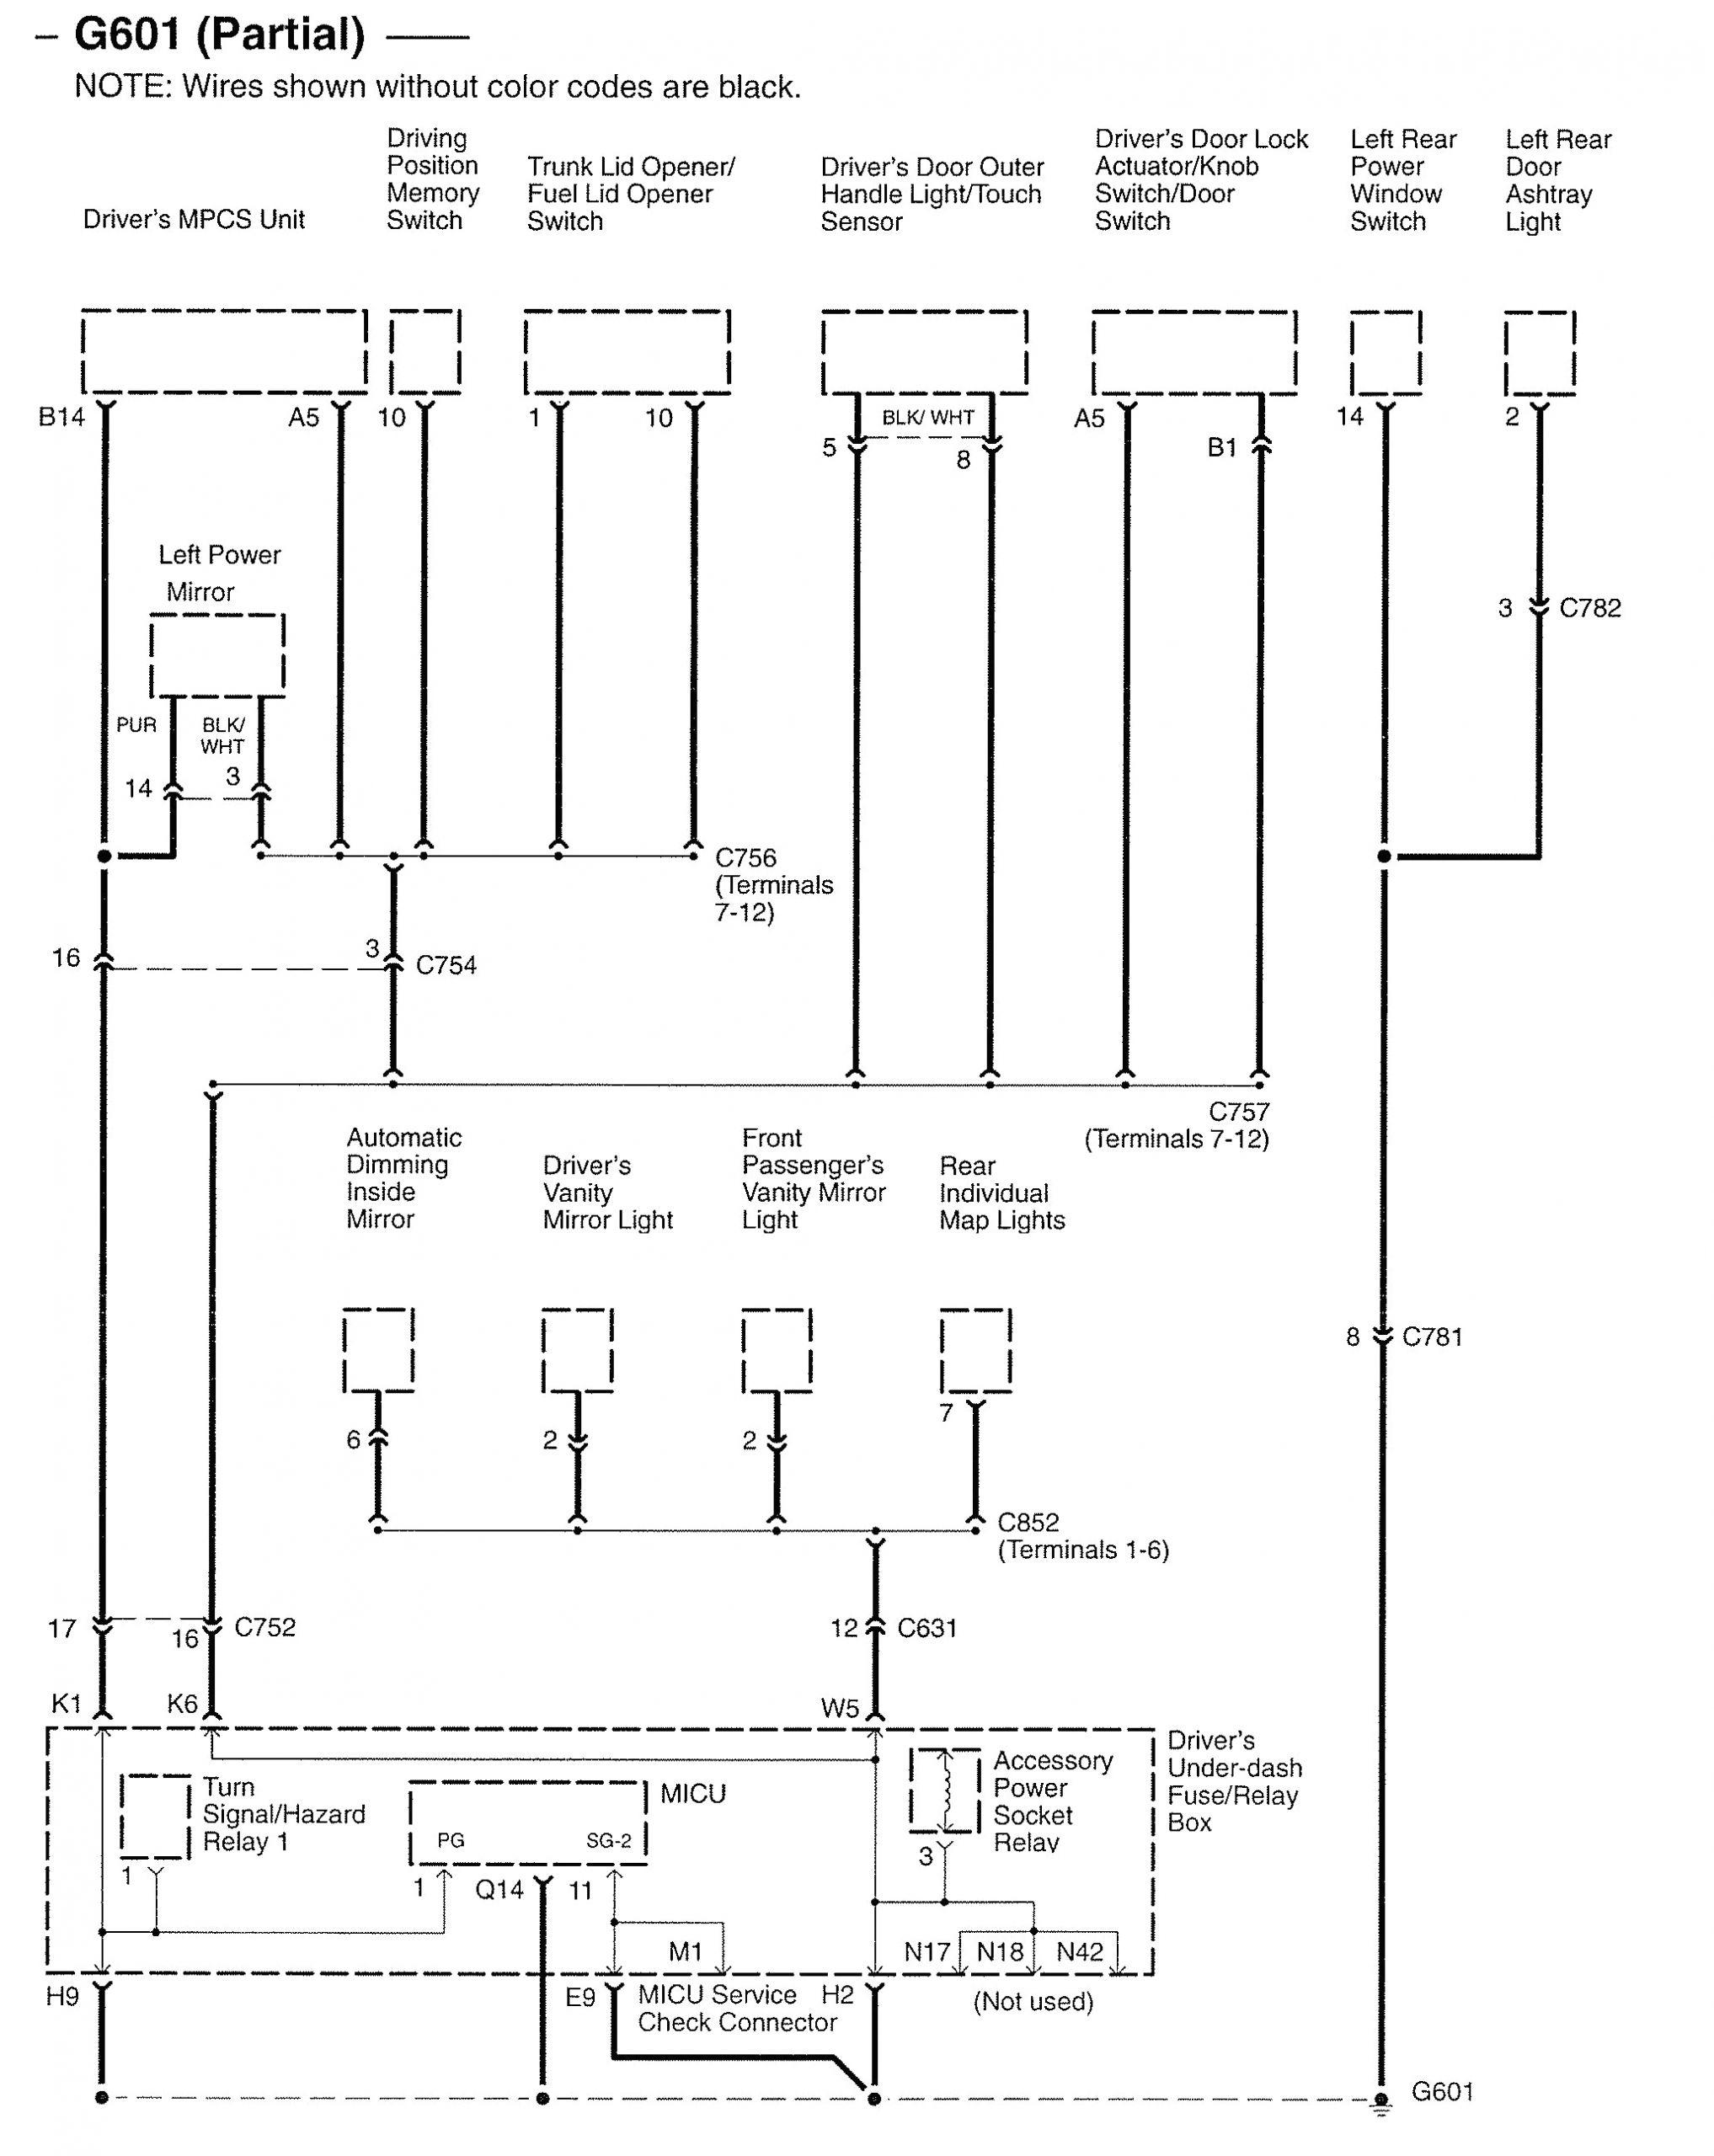 allen bradley stack lights allen bradley 855e bcb wiring diagram shahsramblings com of allen bradley stack lights 2 jpg